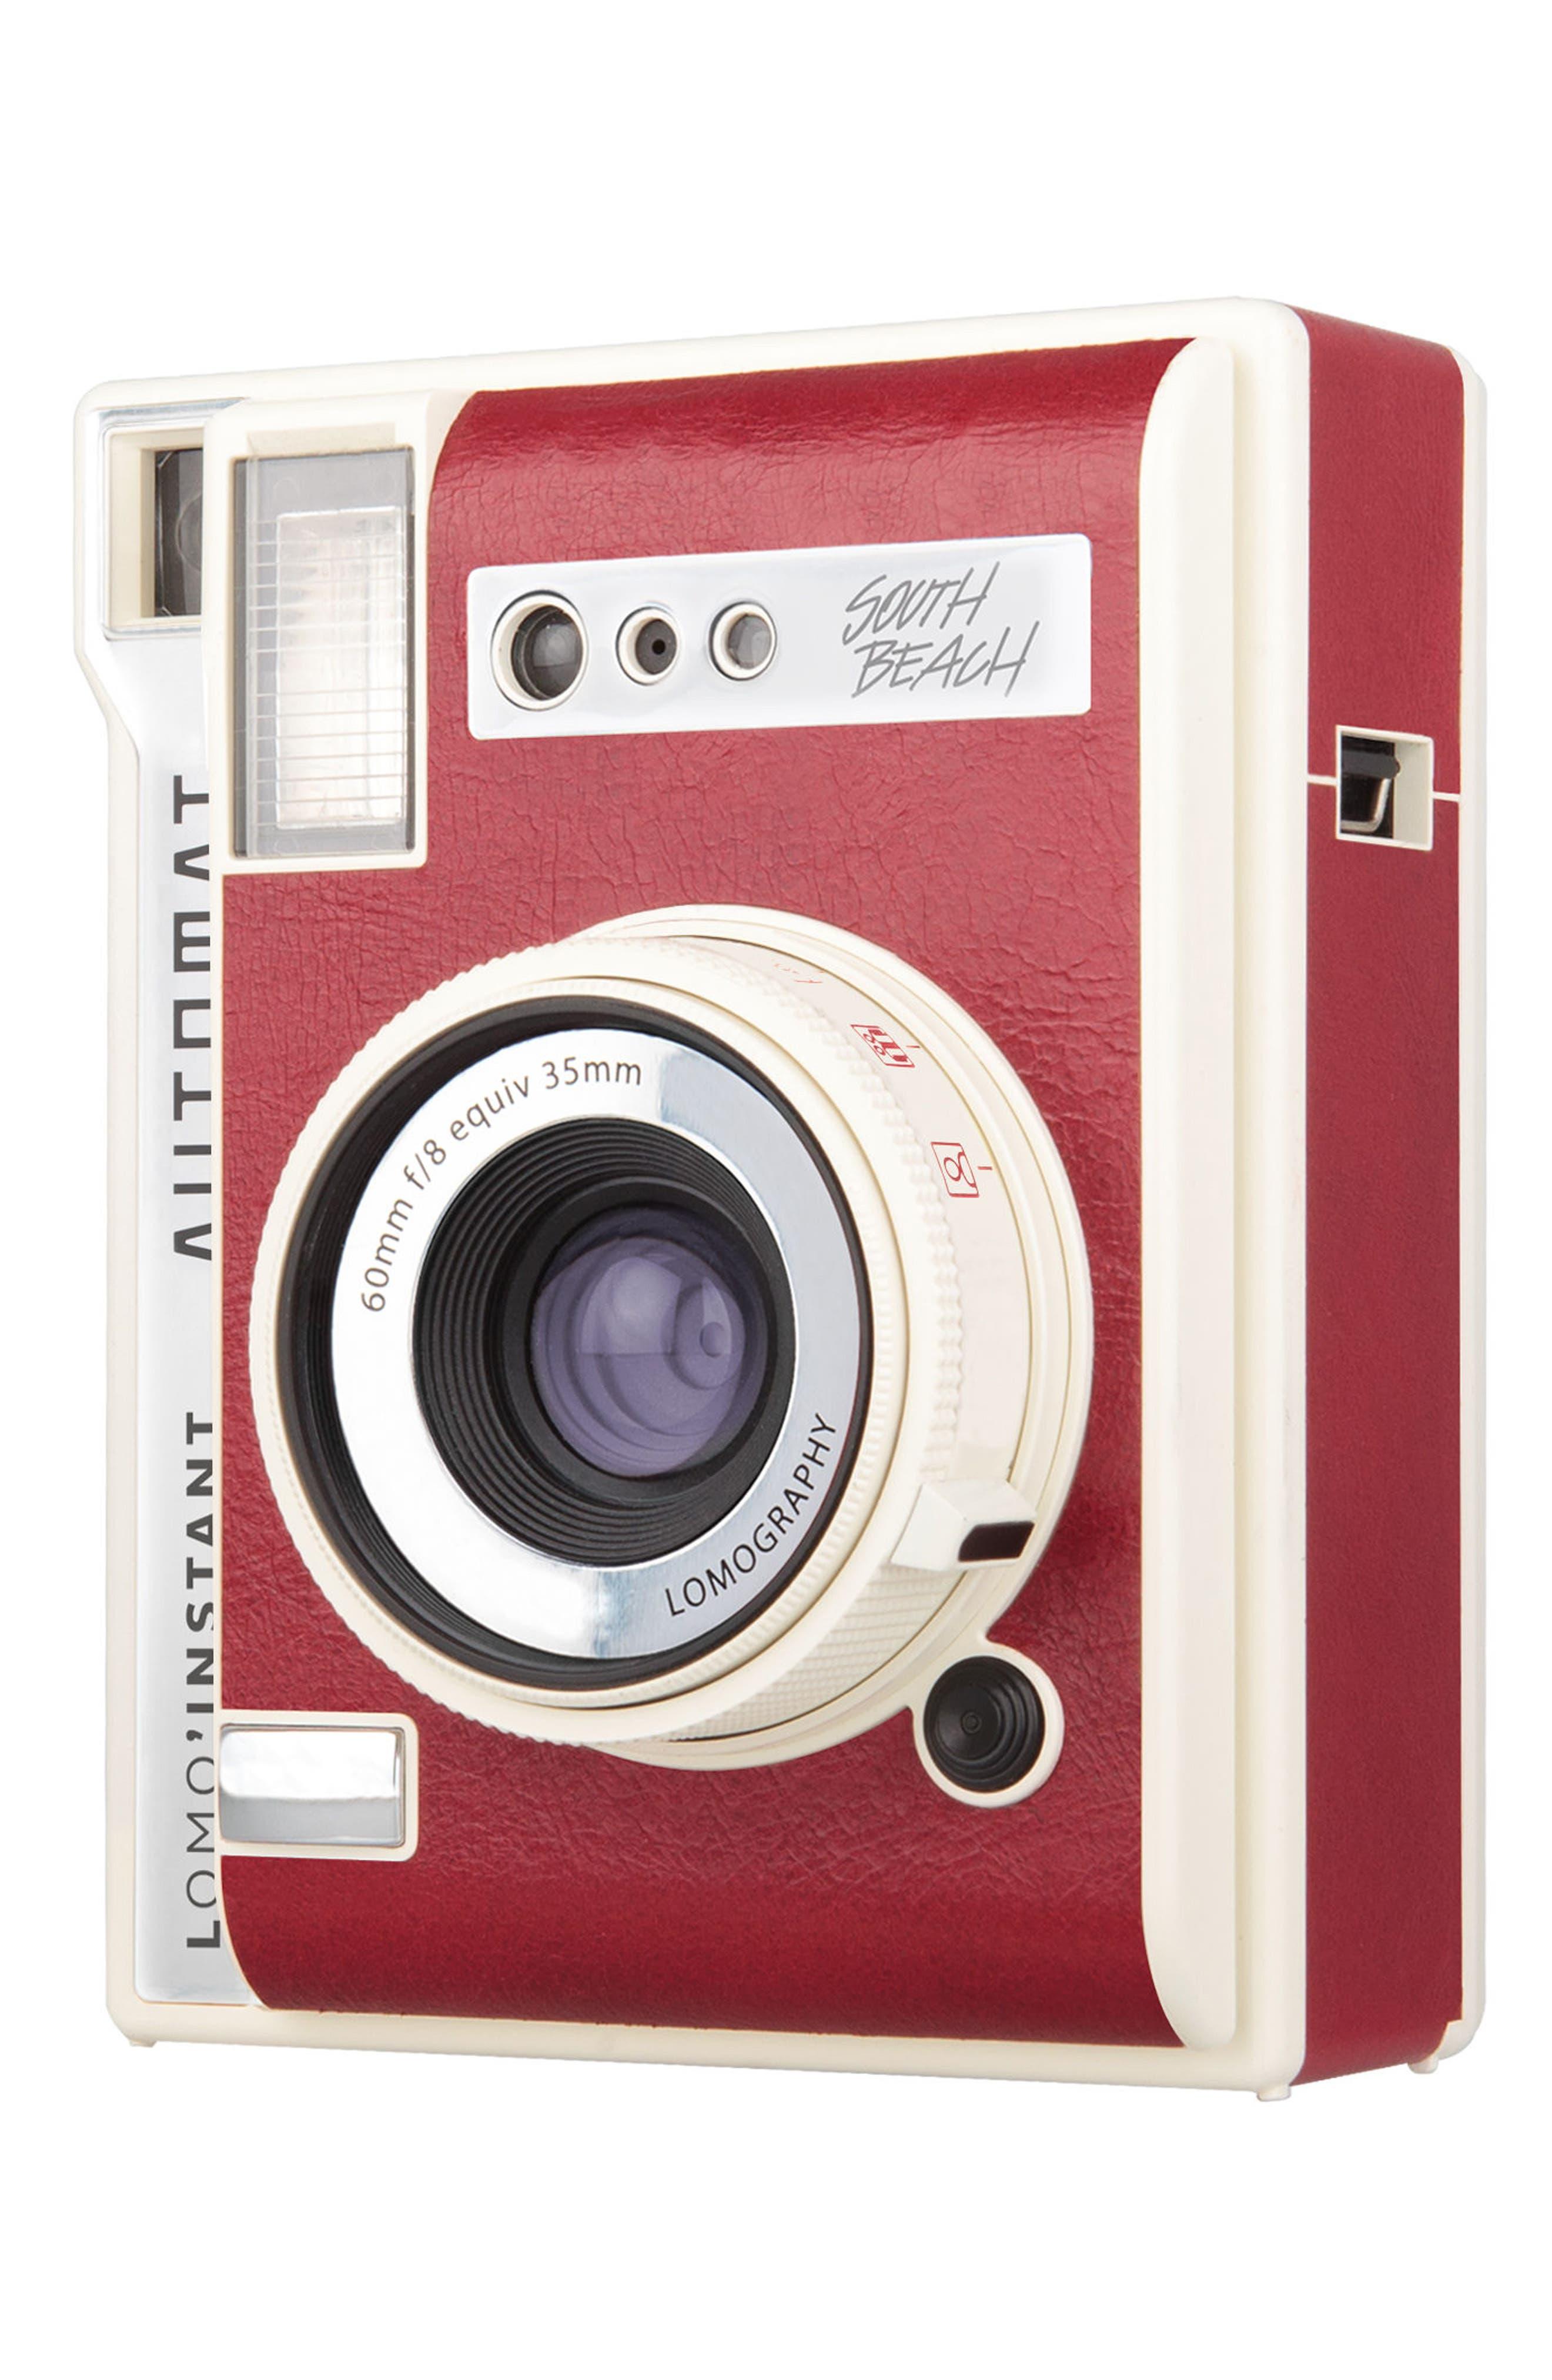 Lomo'Instant Automat South Beach Instant Camera,                             Alternate thumbnail 2, color,                             600